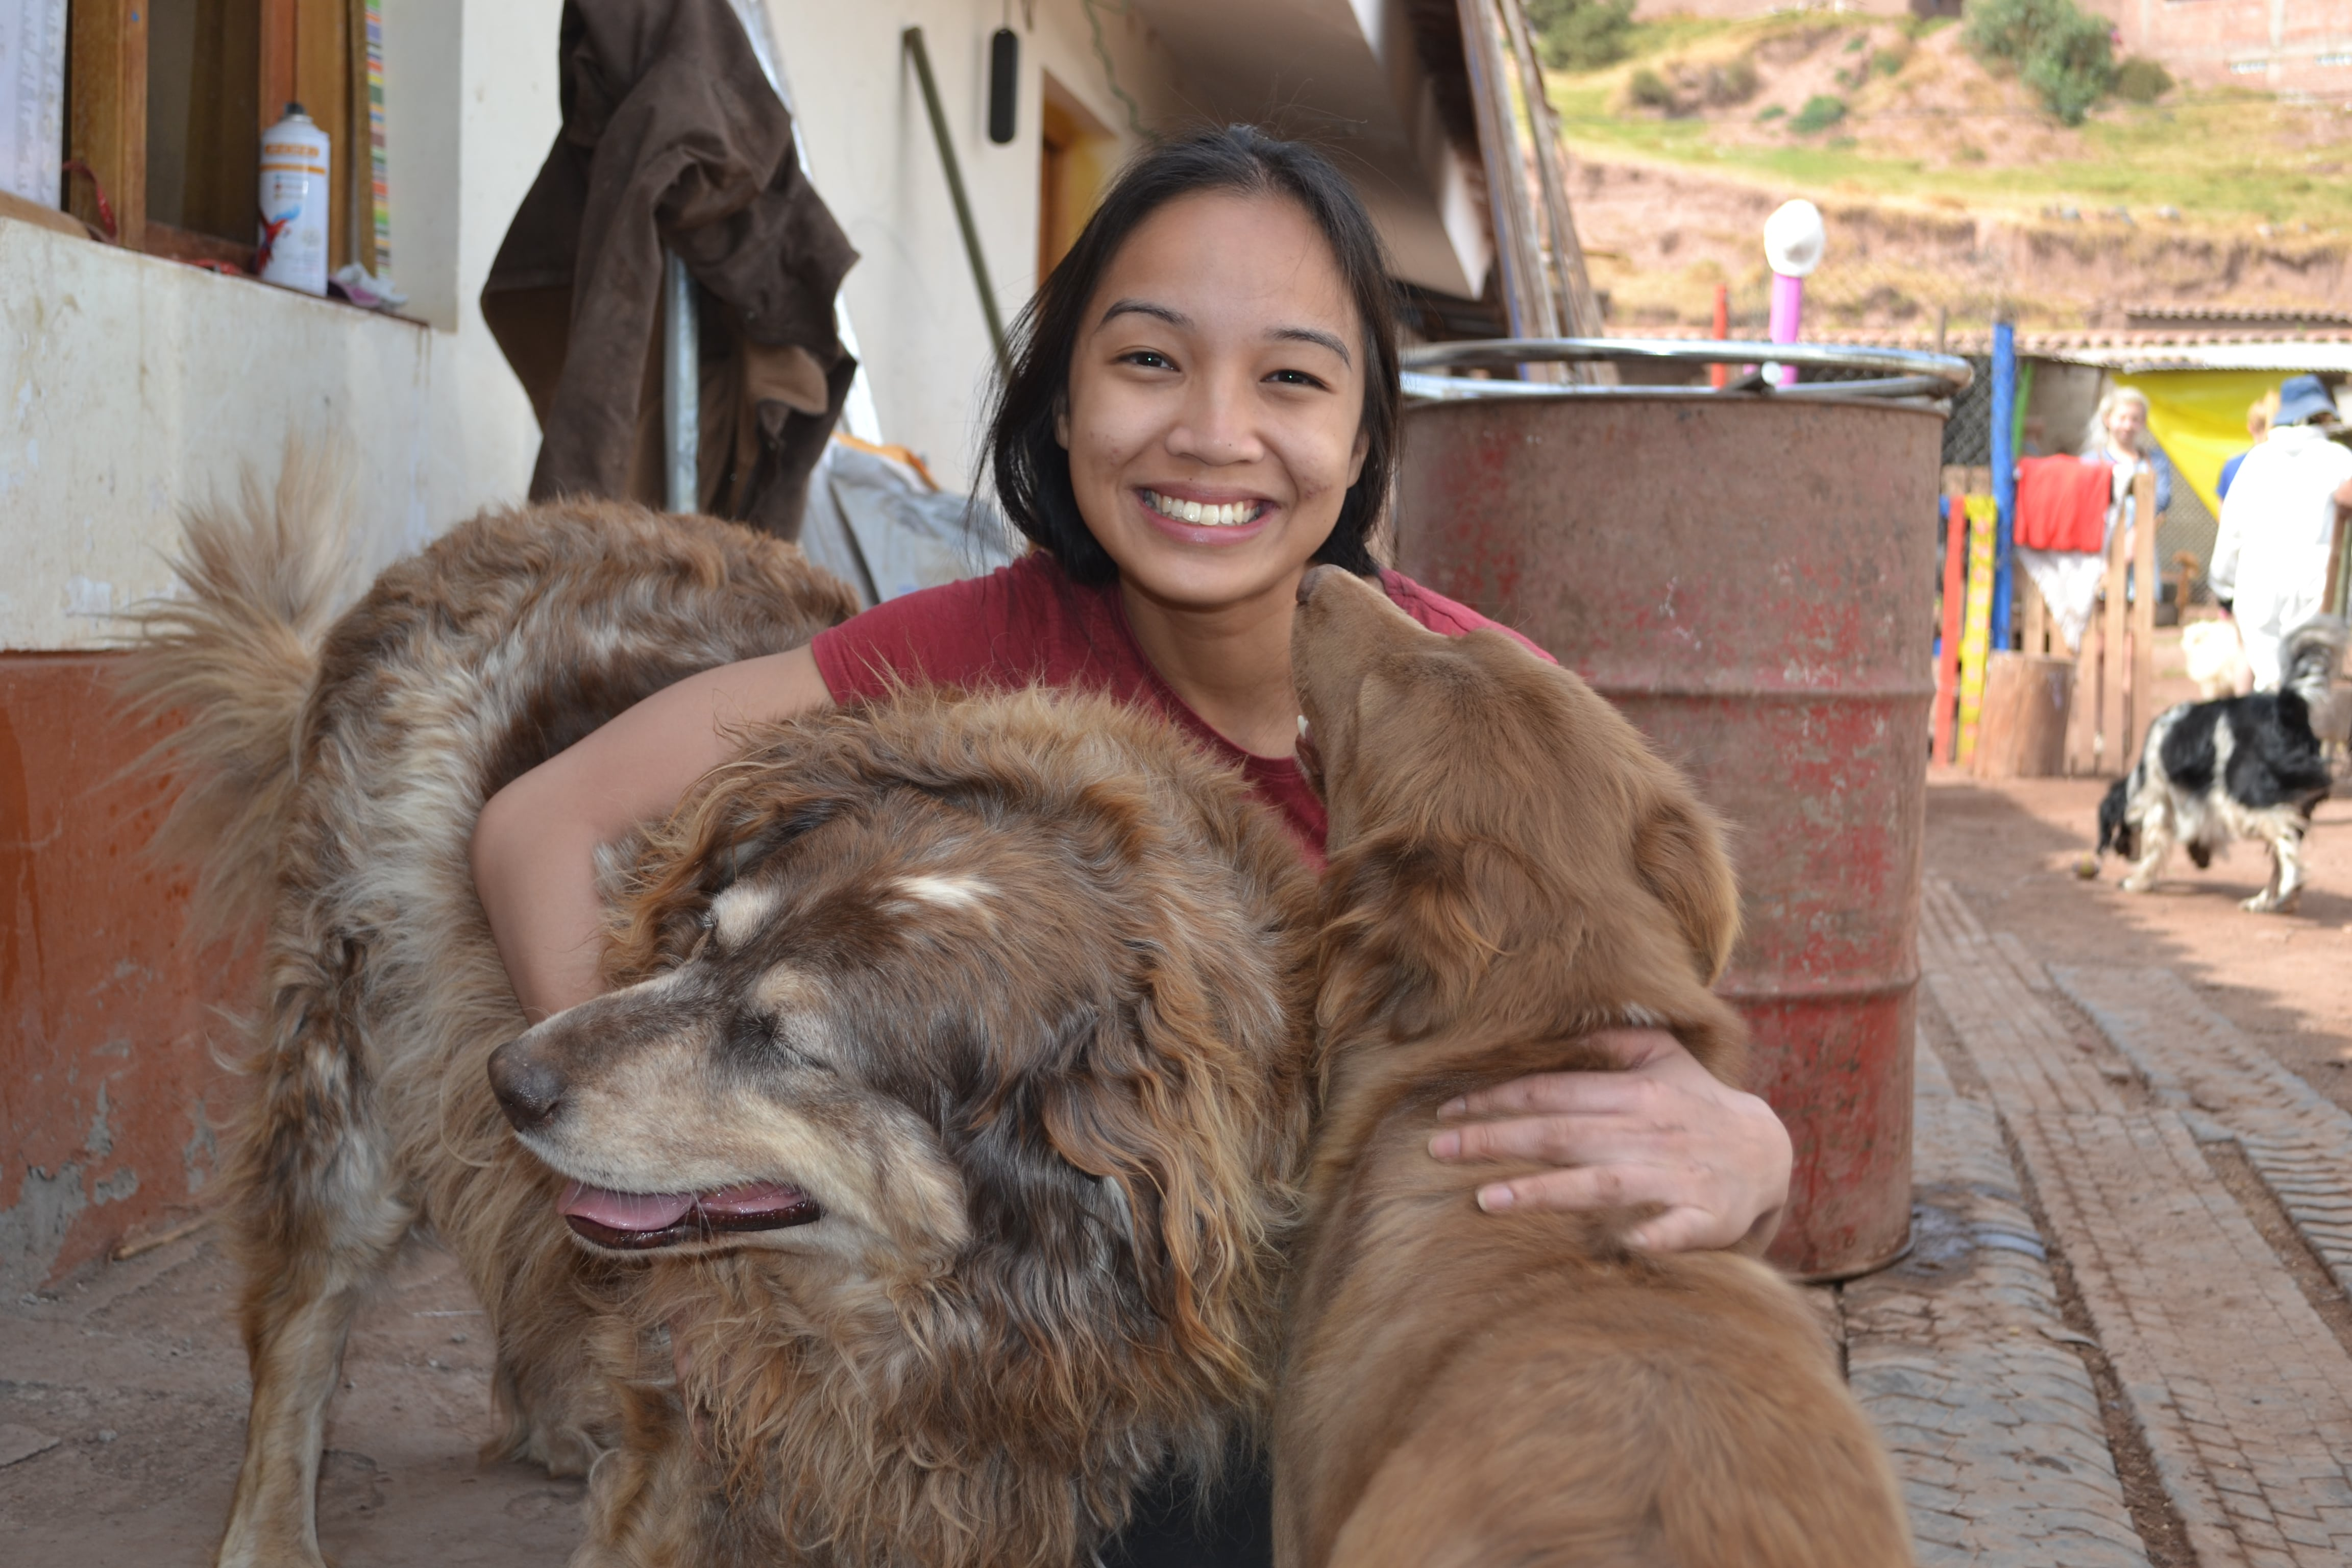 Volunteer at the Peru Dog Rescue Shelter